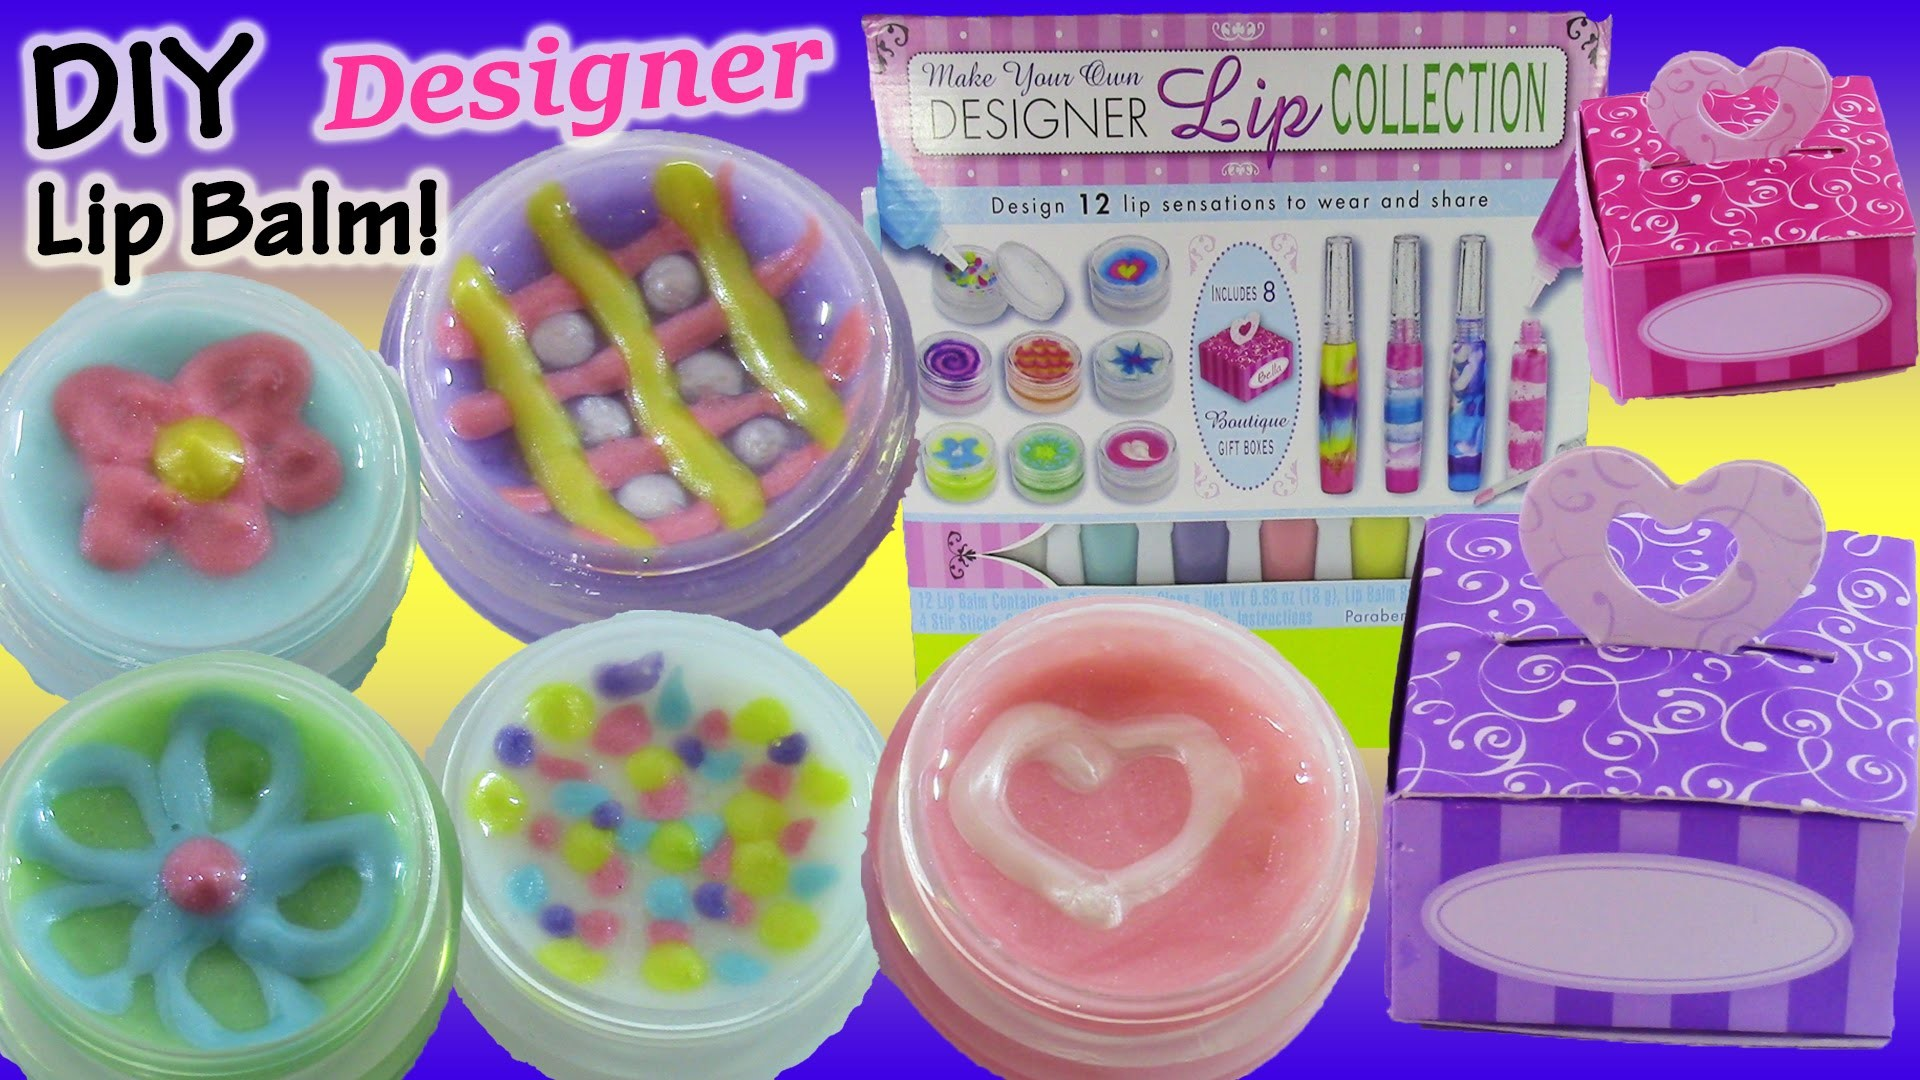 DIY Designer Lip Gloss! Mix Make & Design Your Own Glitter lip Balm! Shopkins Nail Kit! FUN